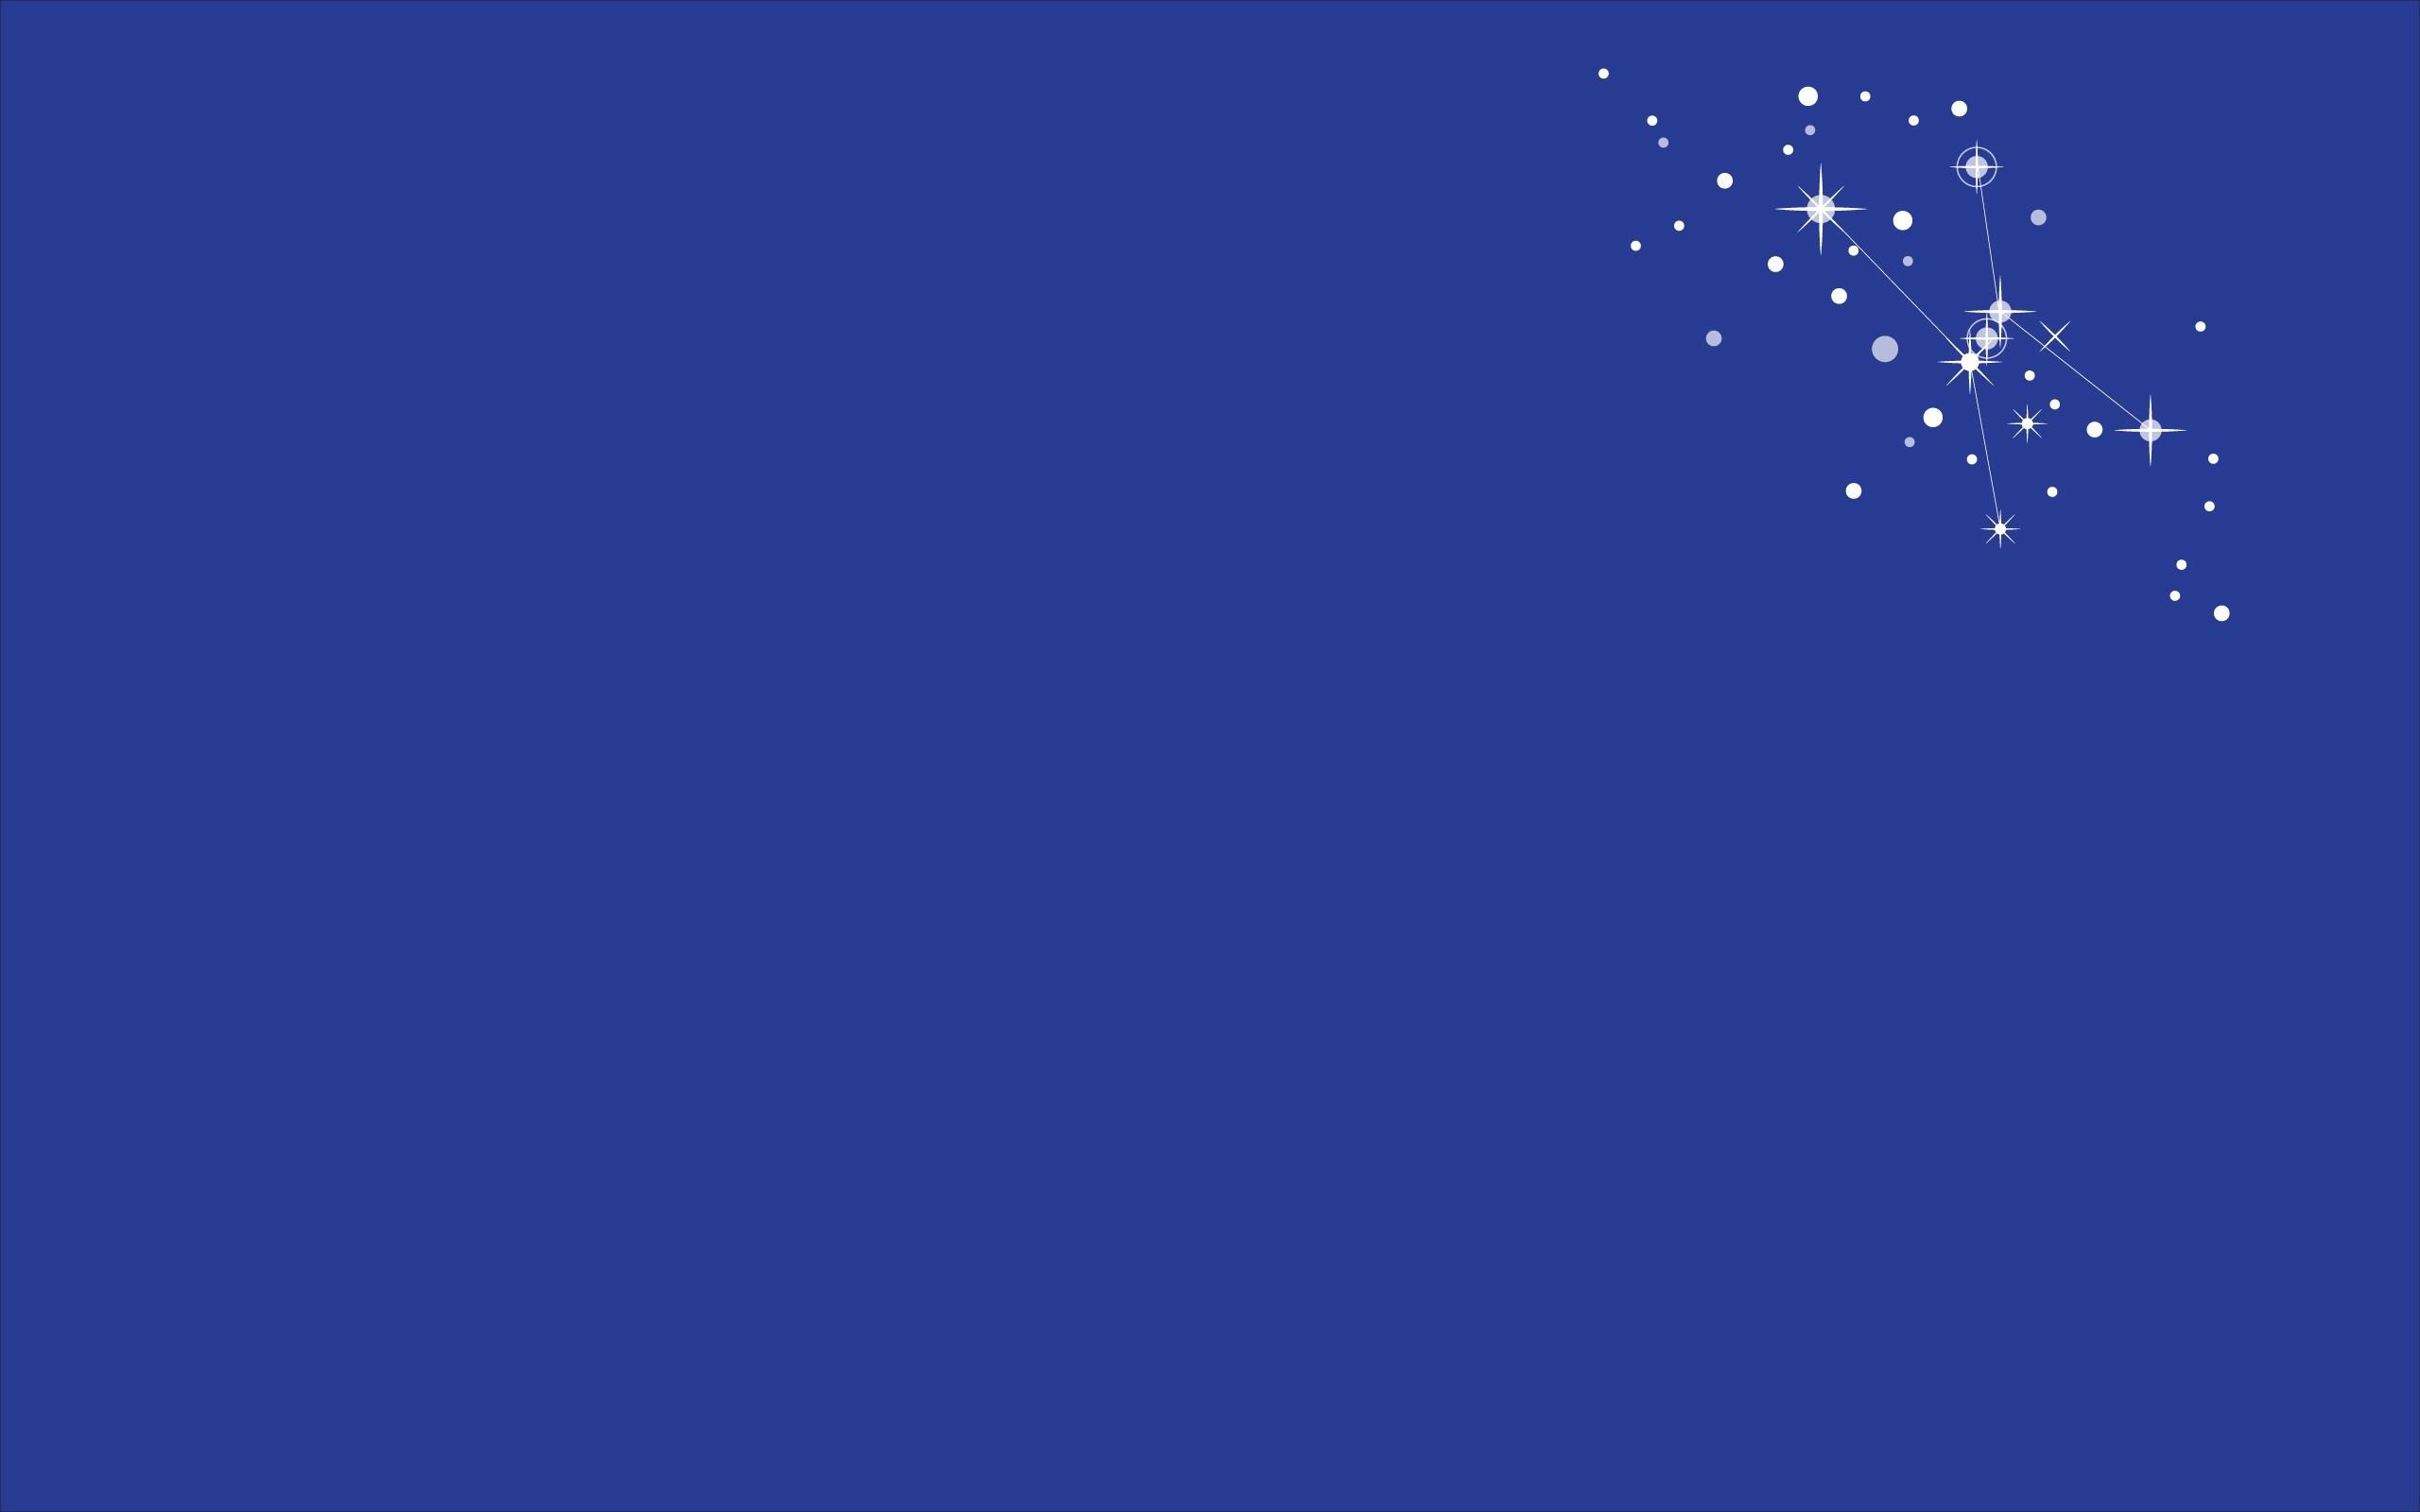 General minimalism digital art stars constellation Orion blue  background